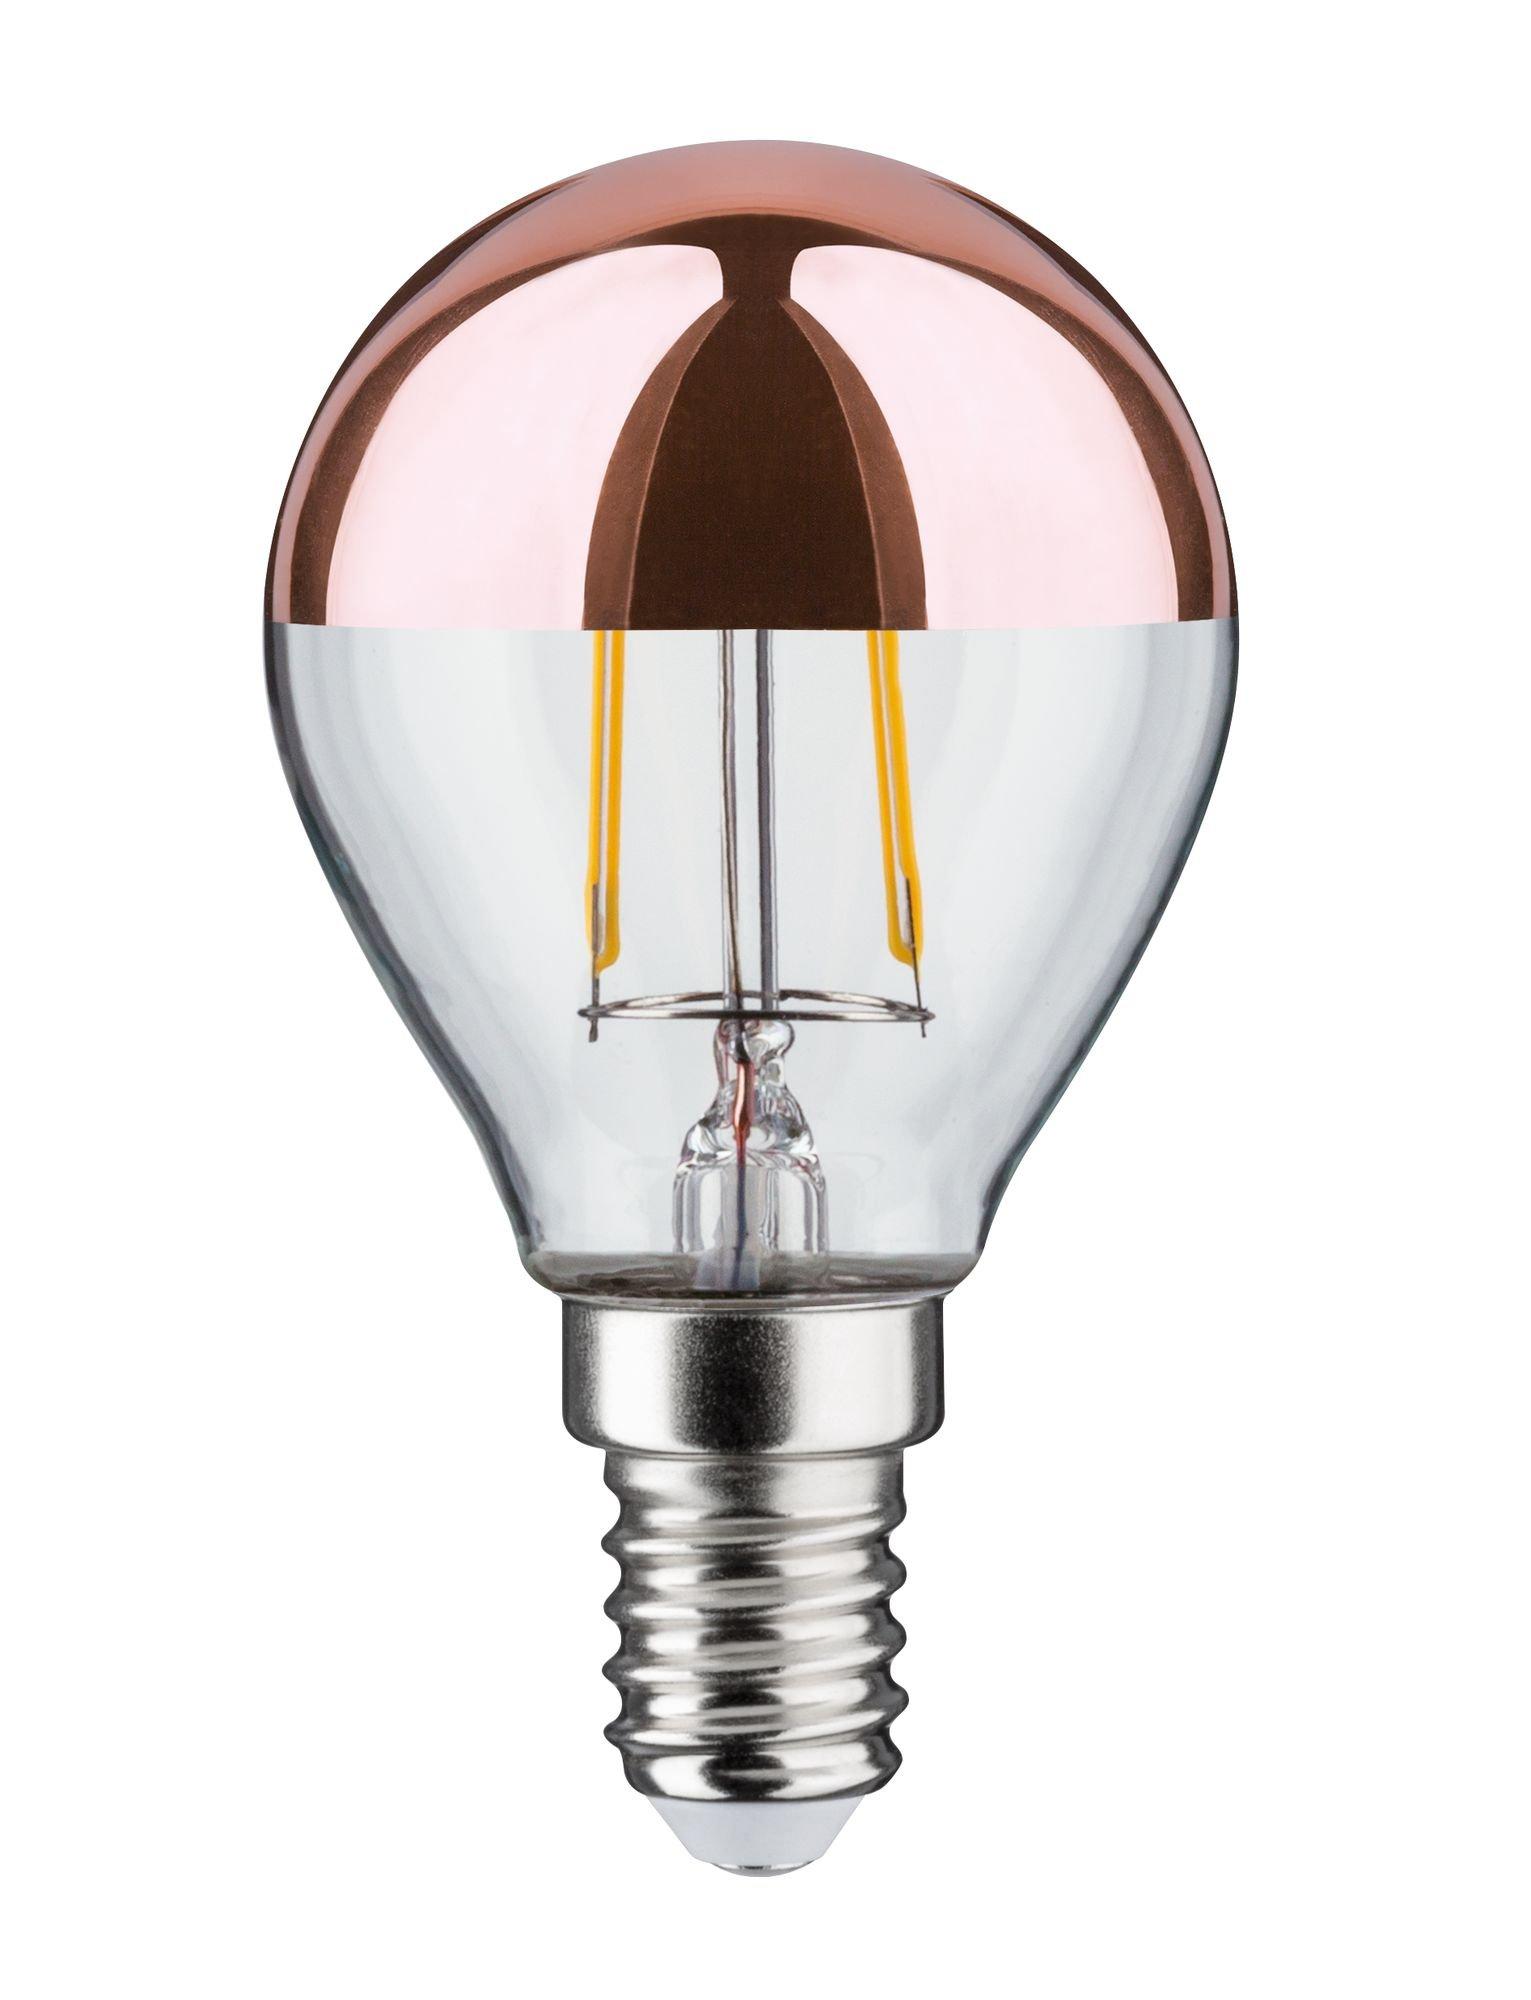 Modern Classic Edition LED-kogellamp Kopspiegel E14 230V 220lm 2,6W 2700K Kopspiegel koper